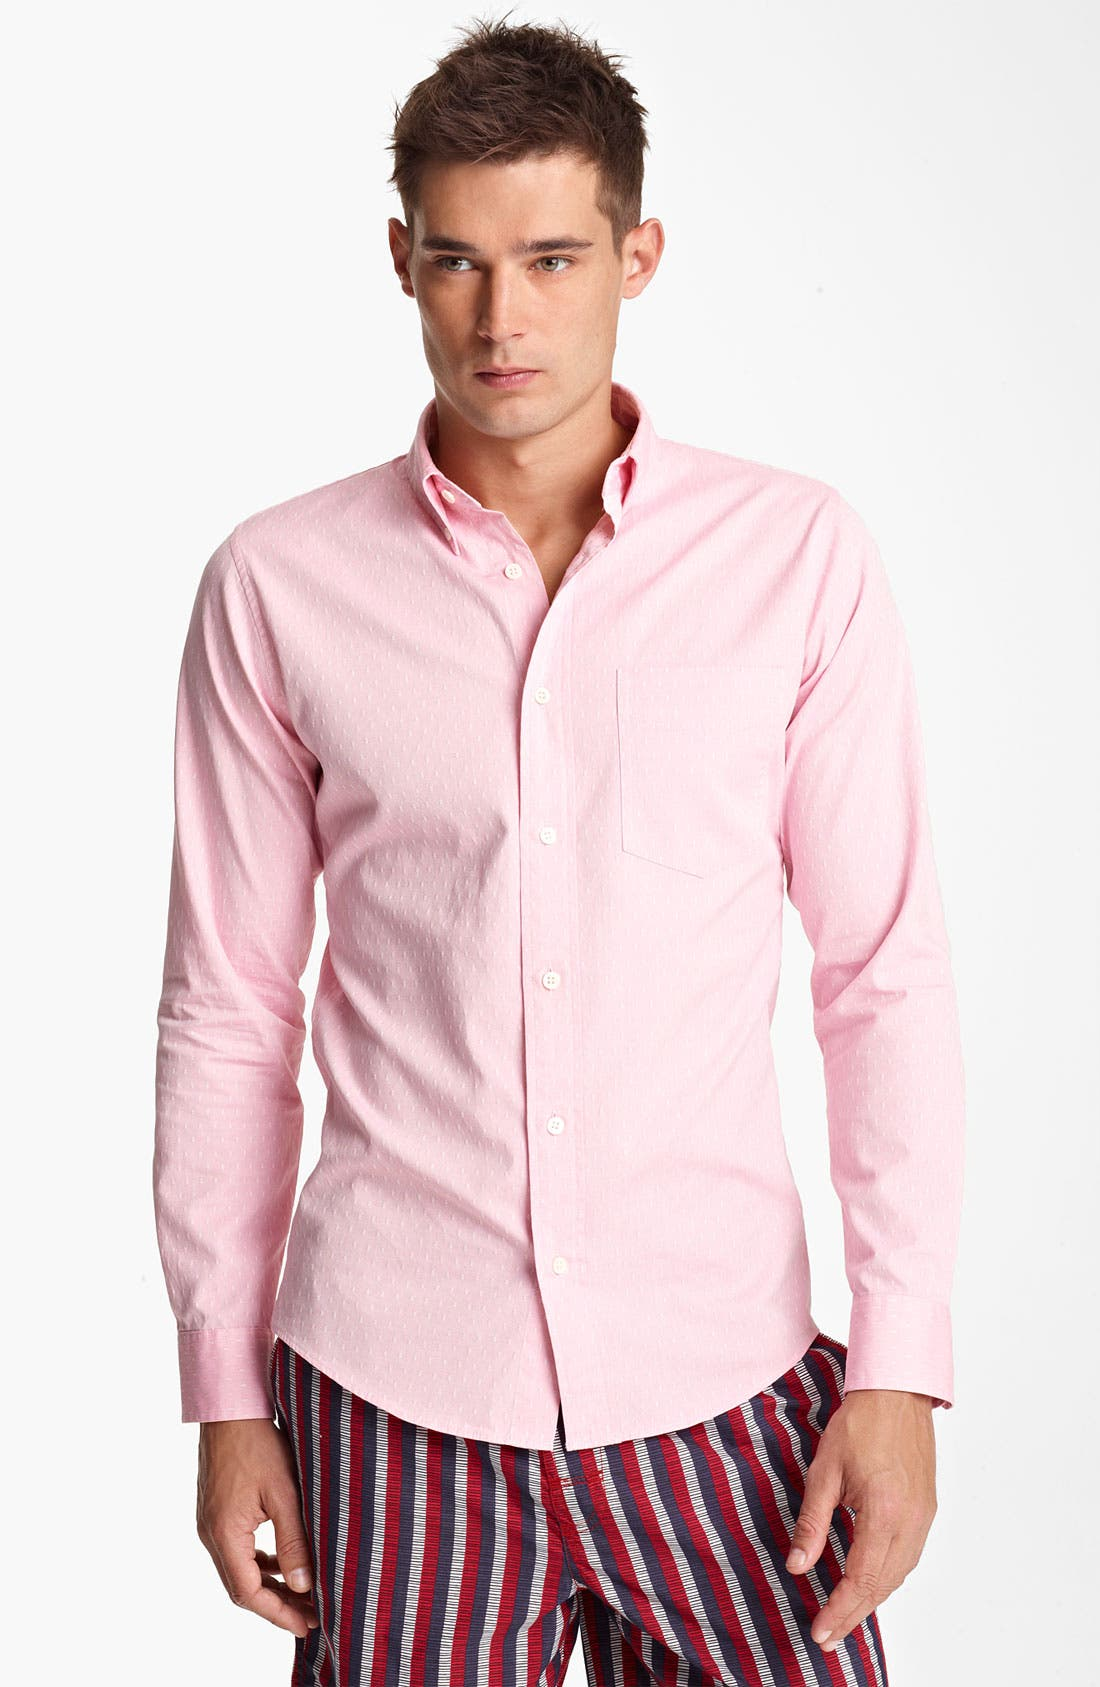 Alternate Image 1 Selected - Jack Spade 'Yeoman' Woven Shirt